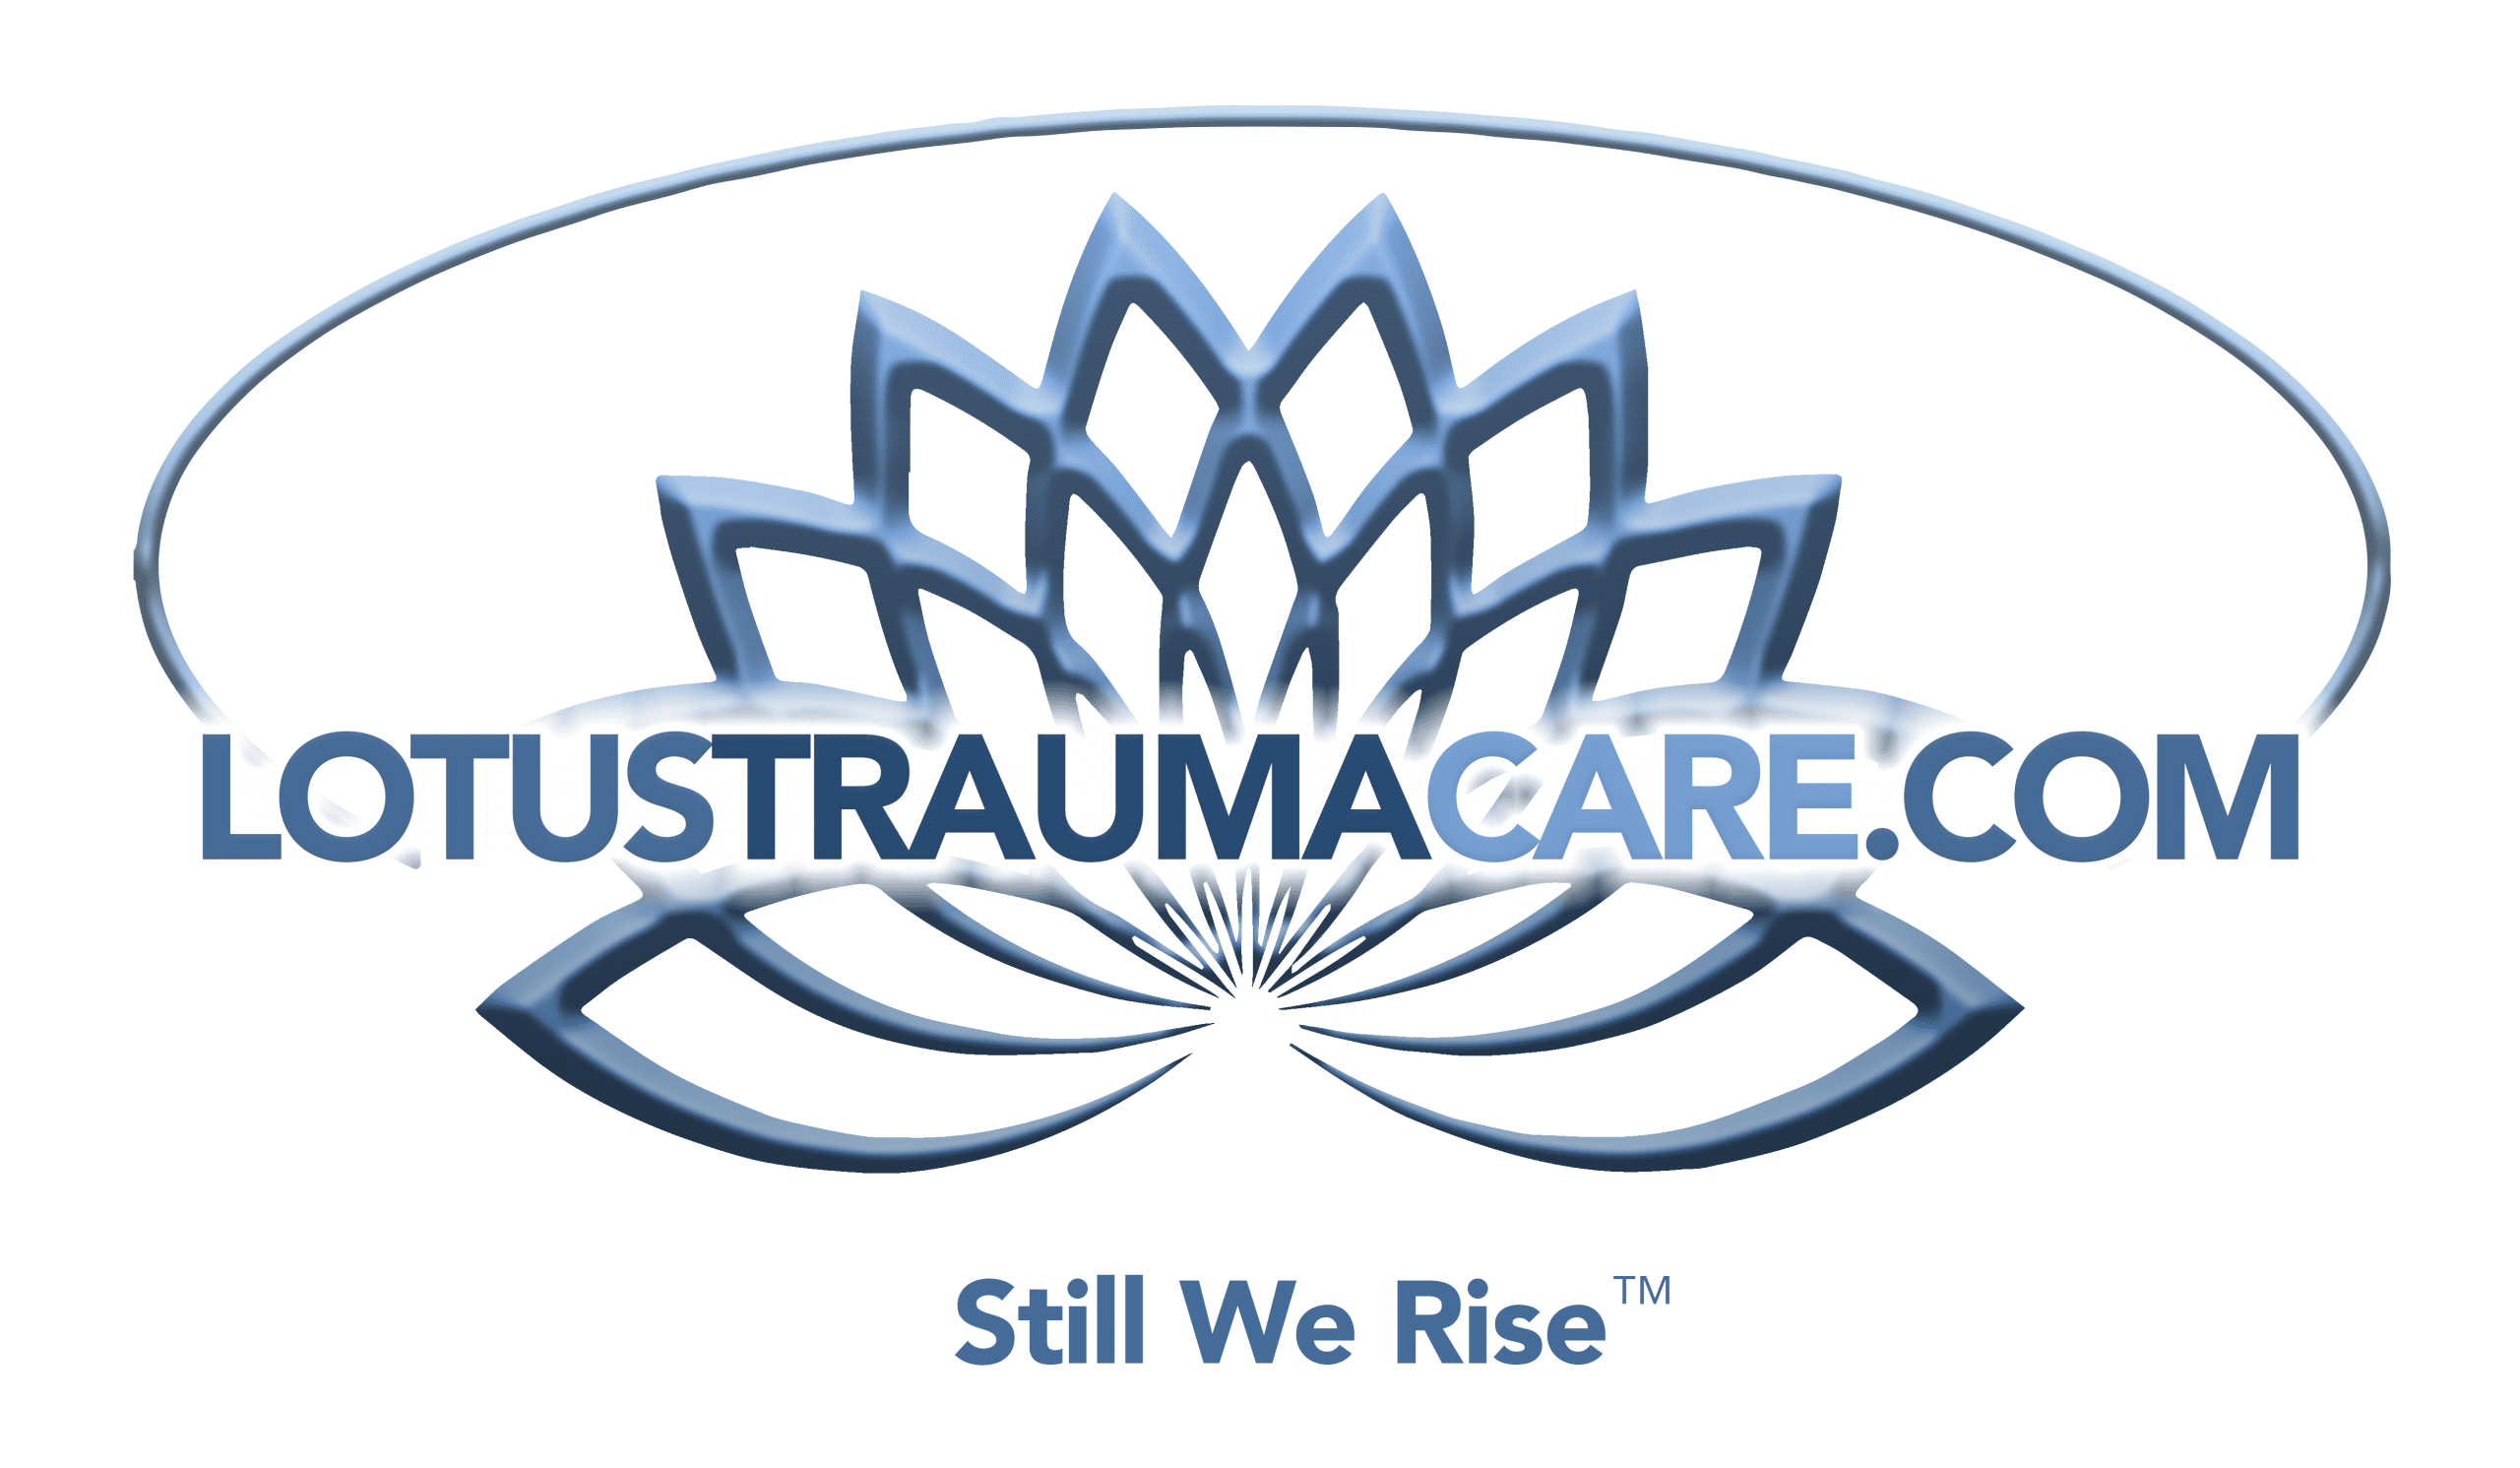 Lotus Trauma Care, LLC